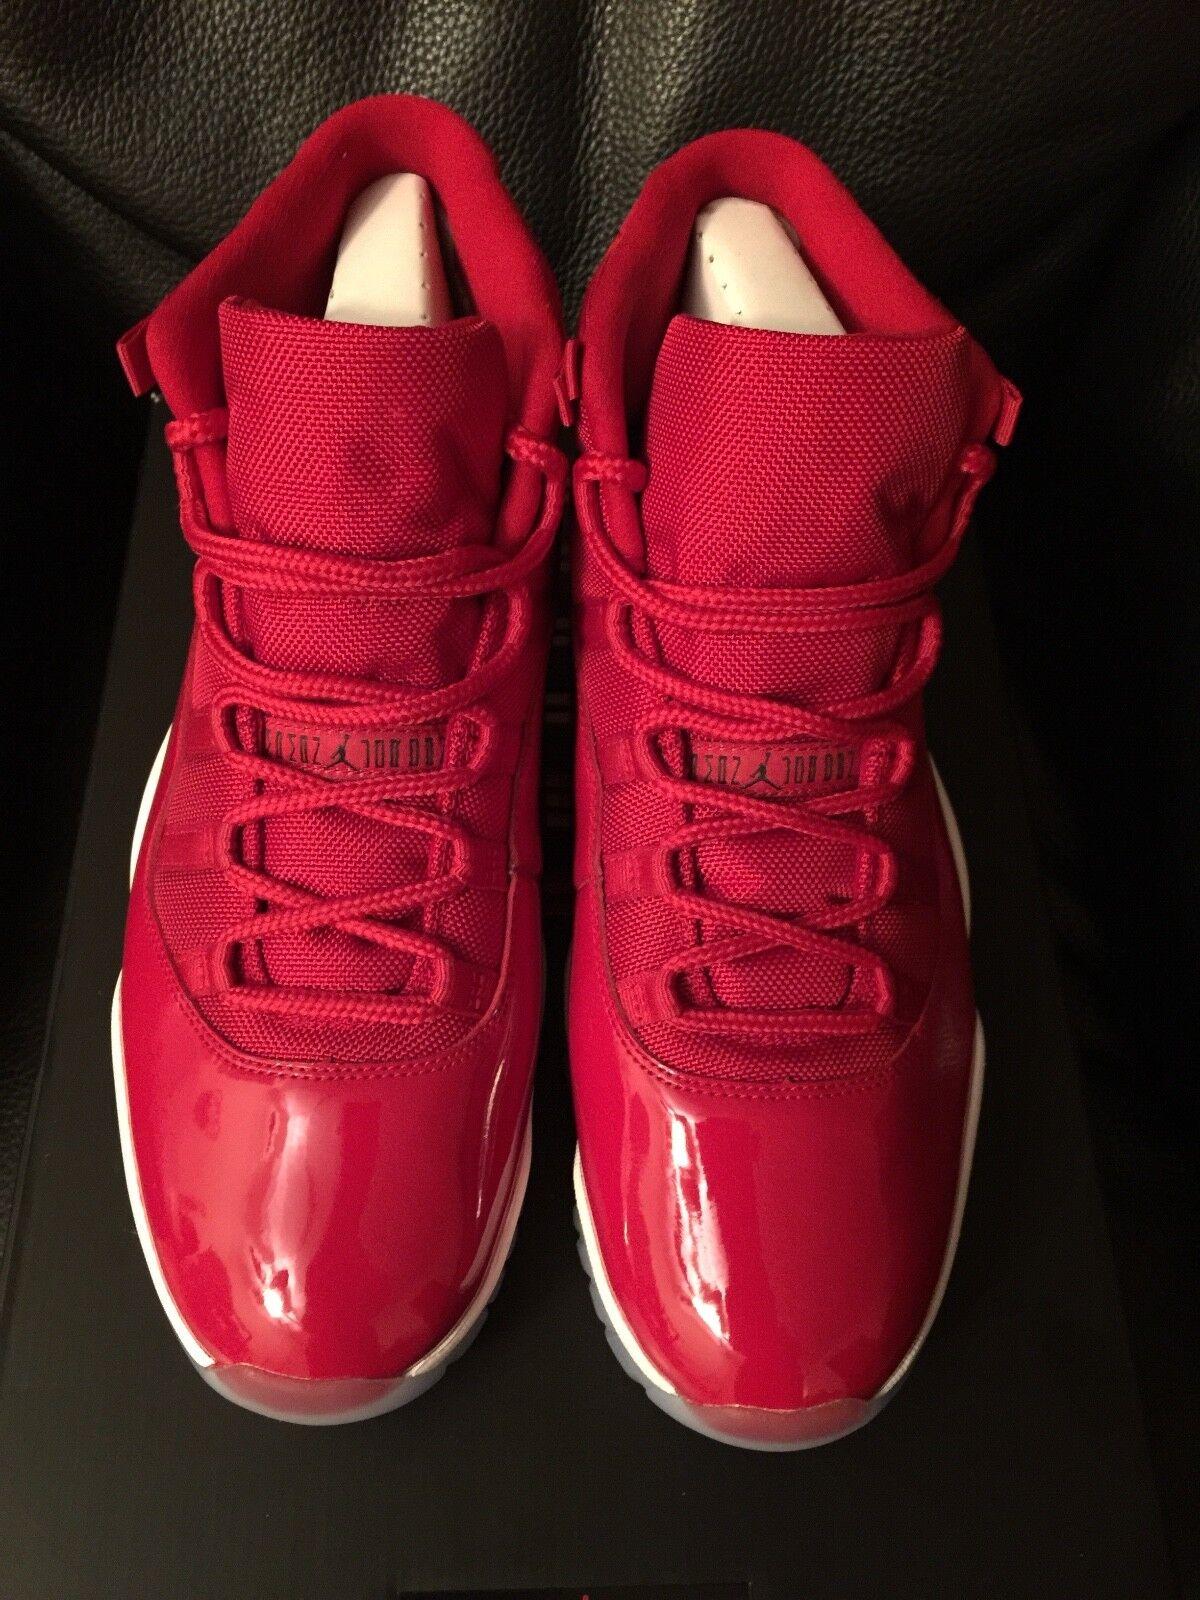 NEW Air Jordan 11 Retro XI Red Mens Size 13